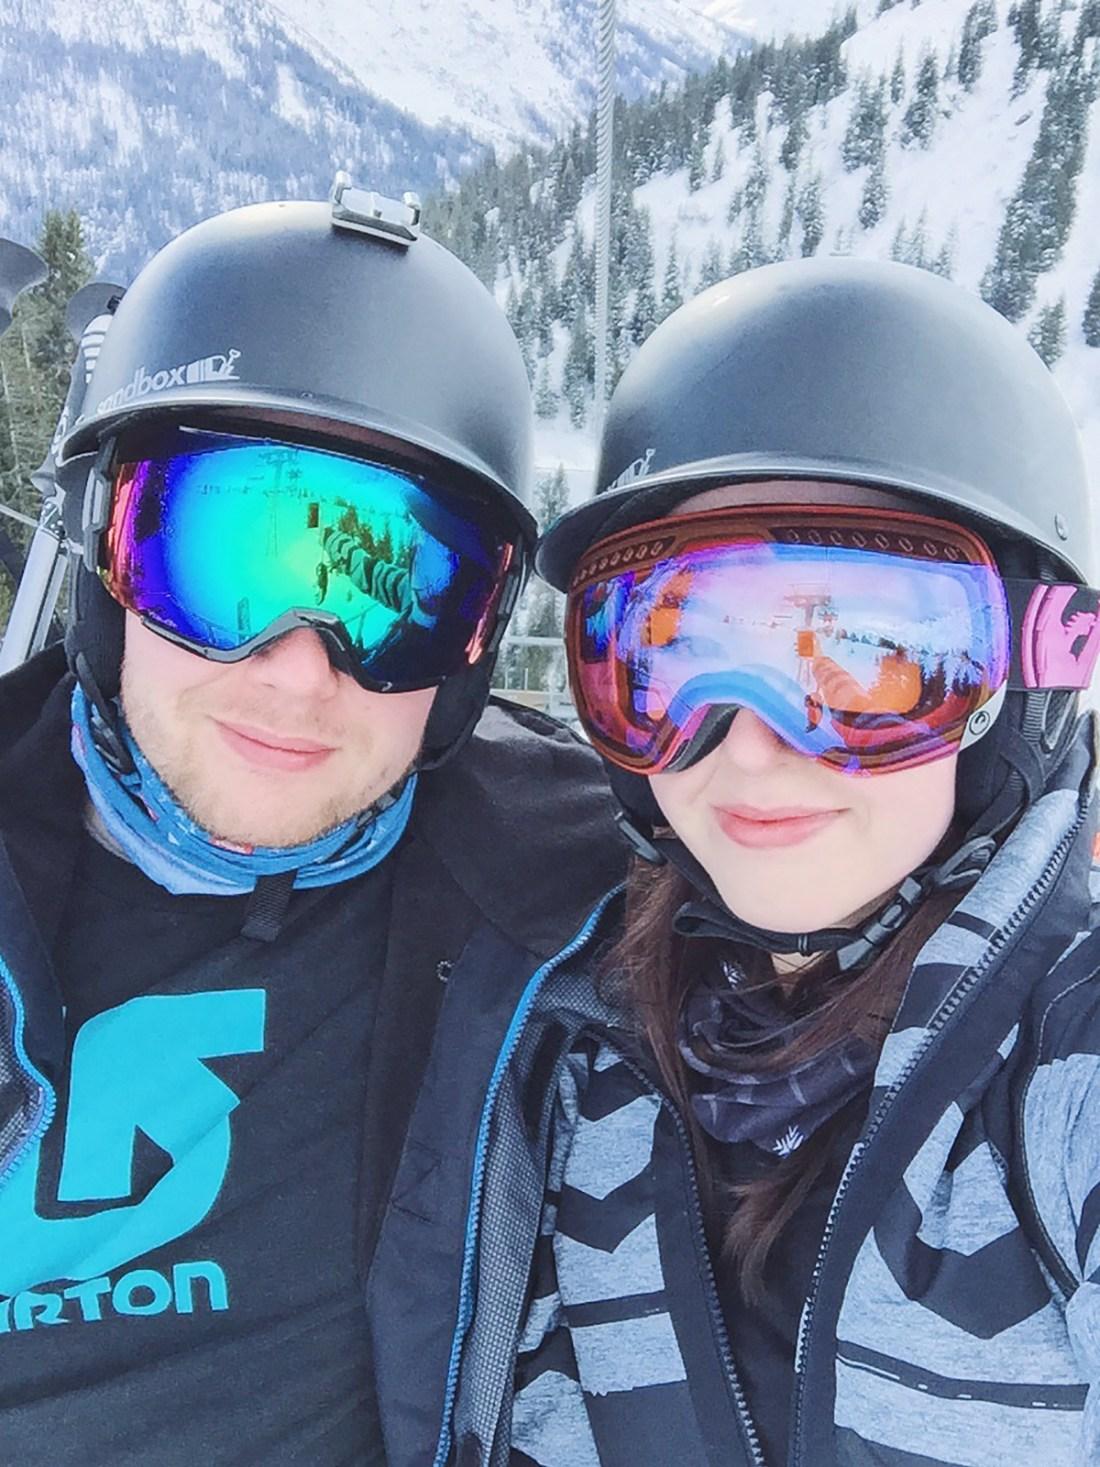 st-anton-lift-skiing-selfie